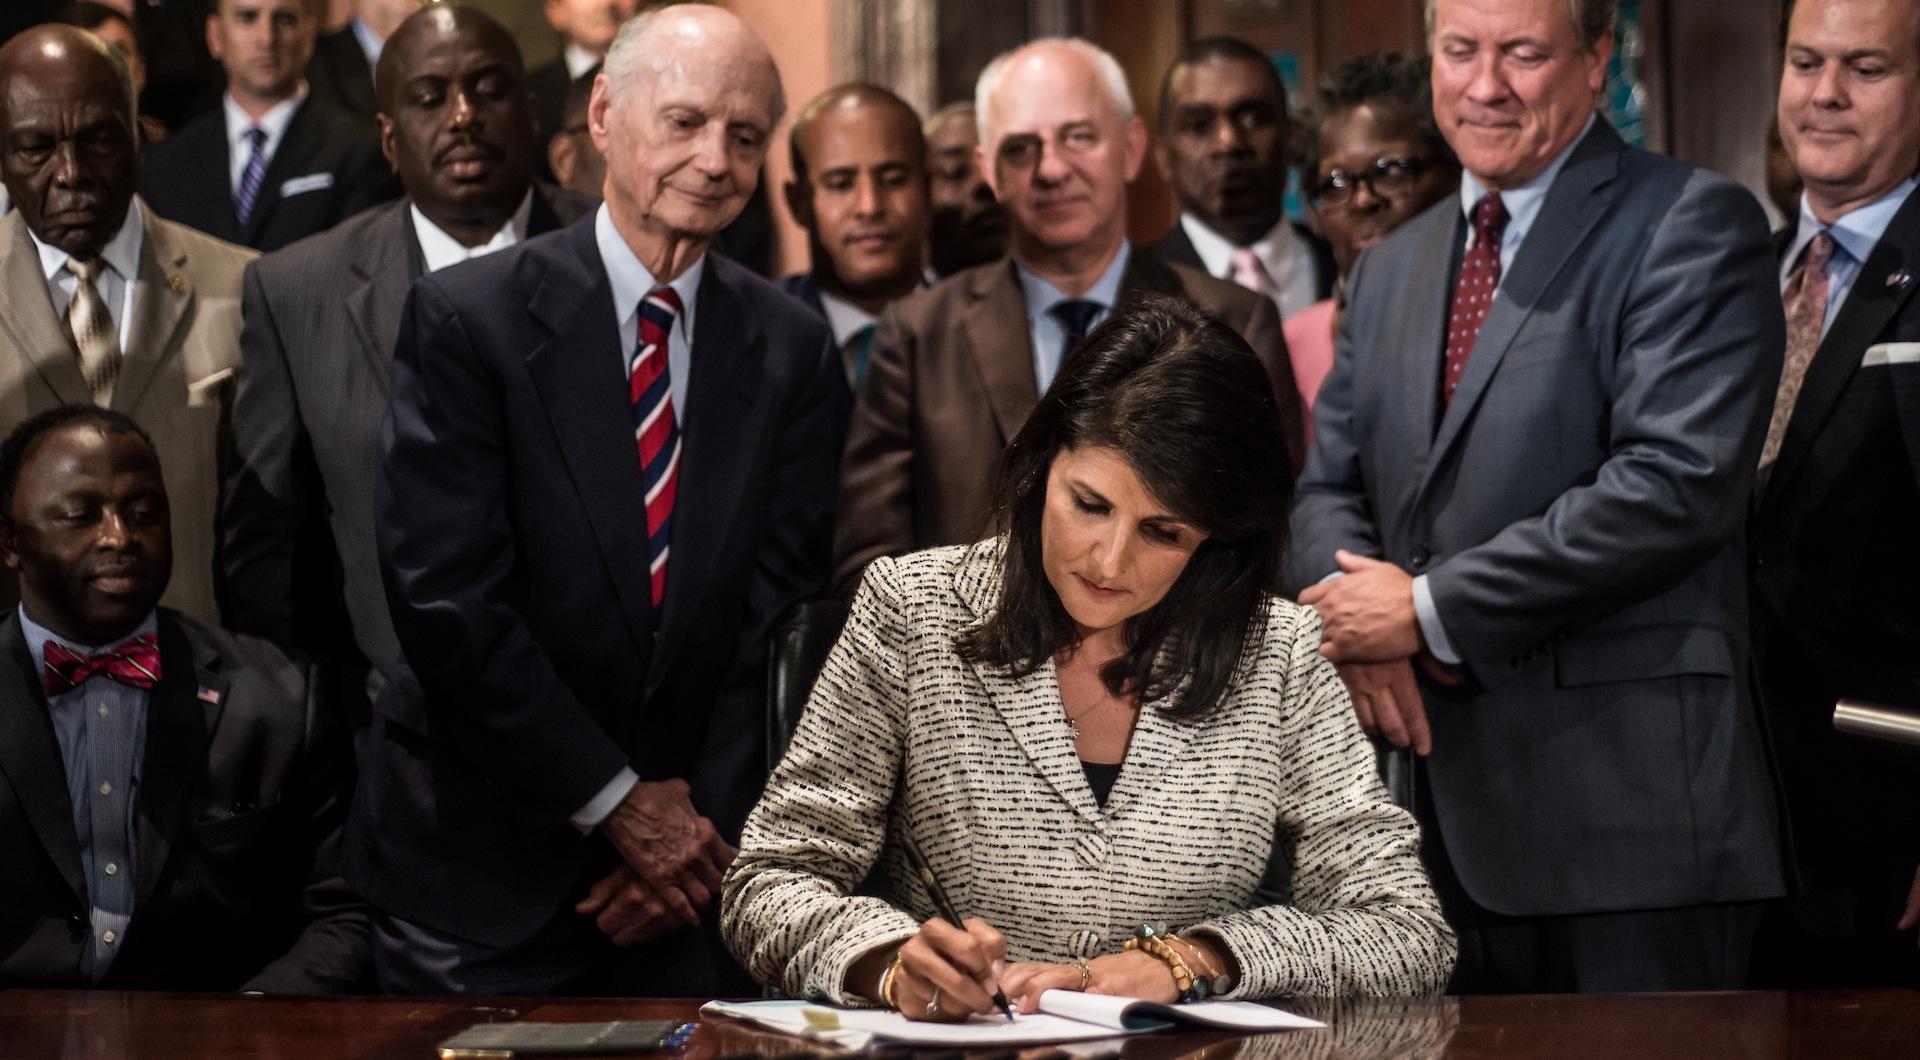 South Carolina's losing battle to rewrite its racist history